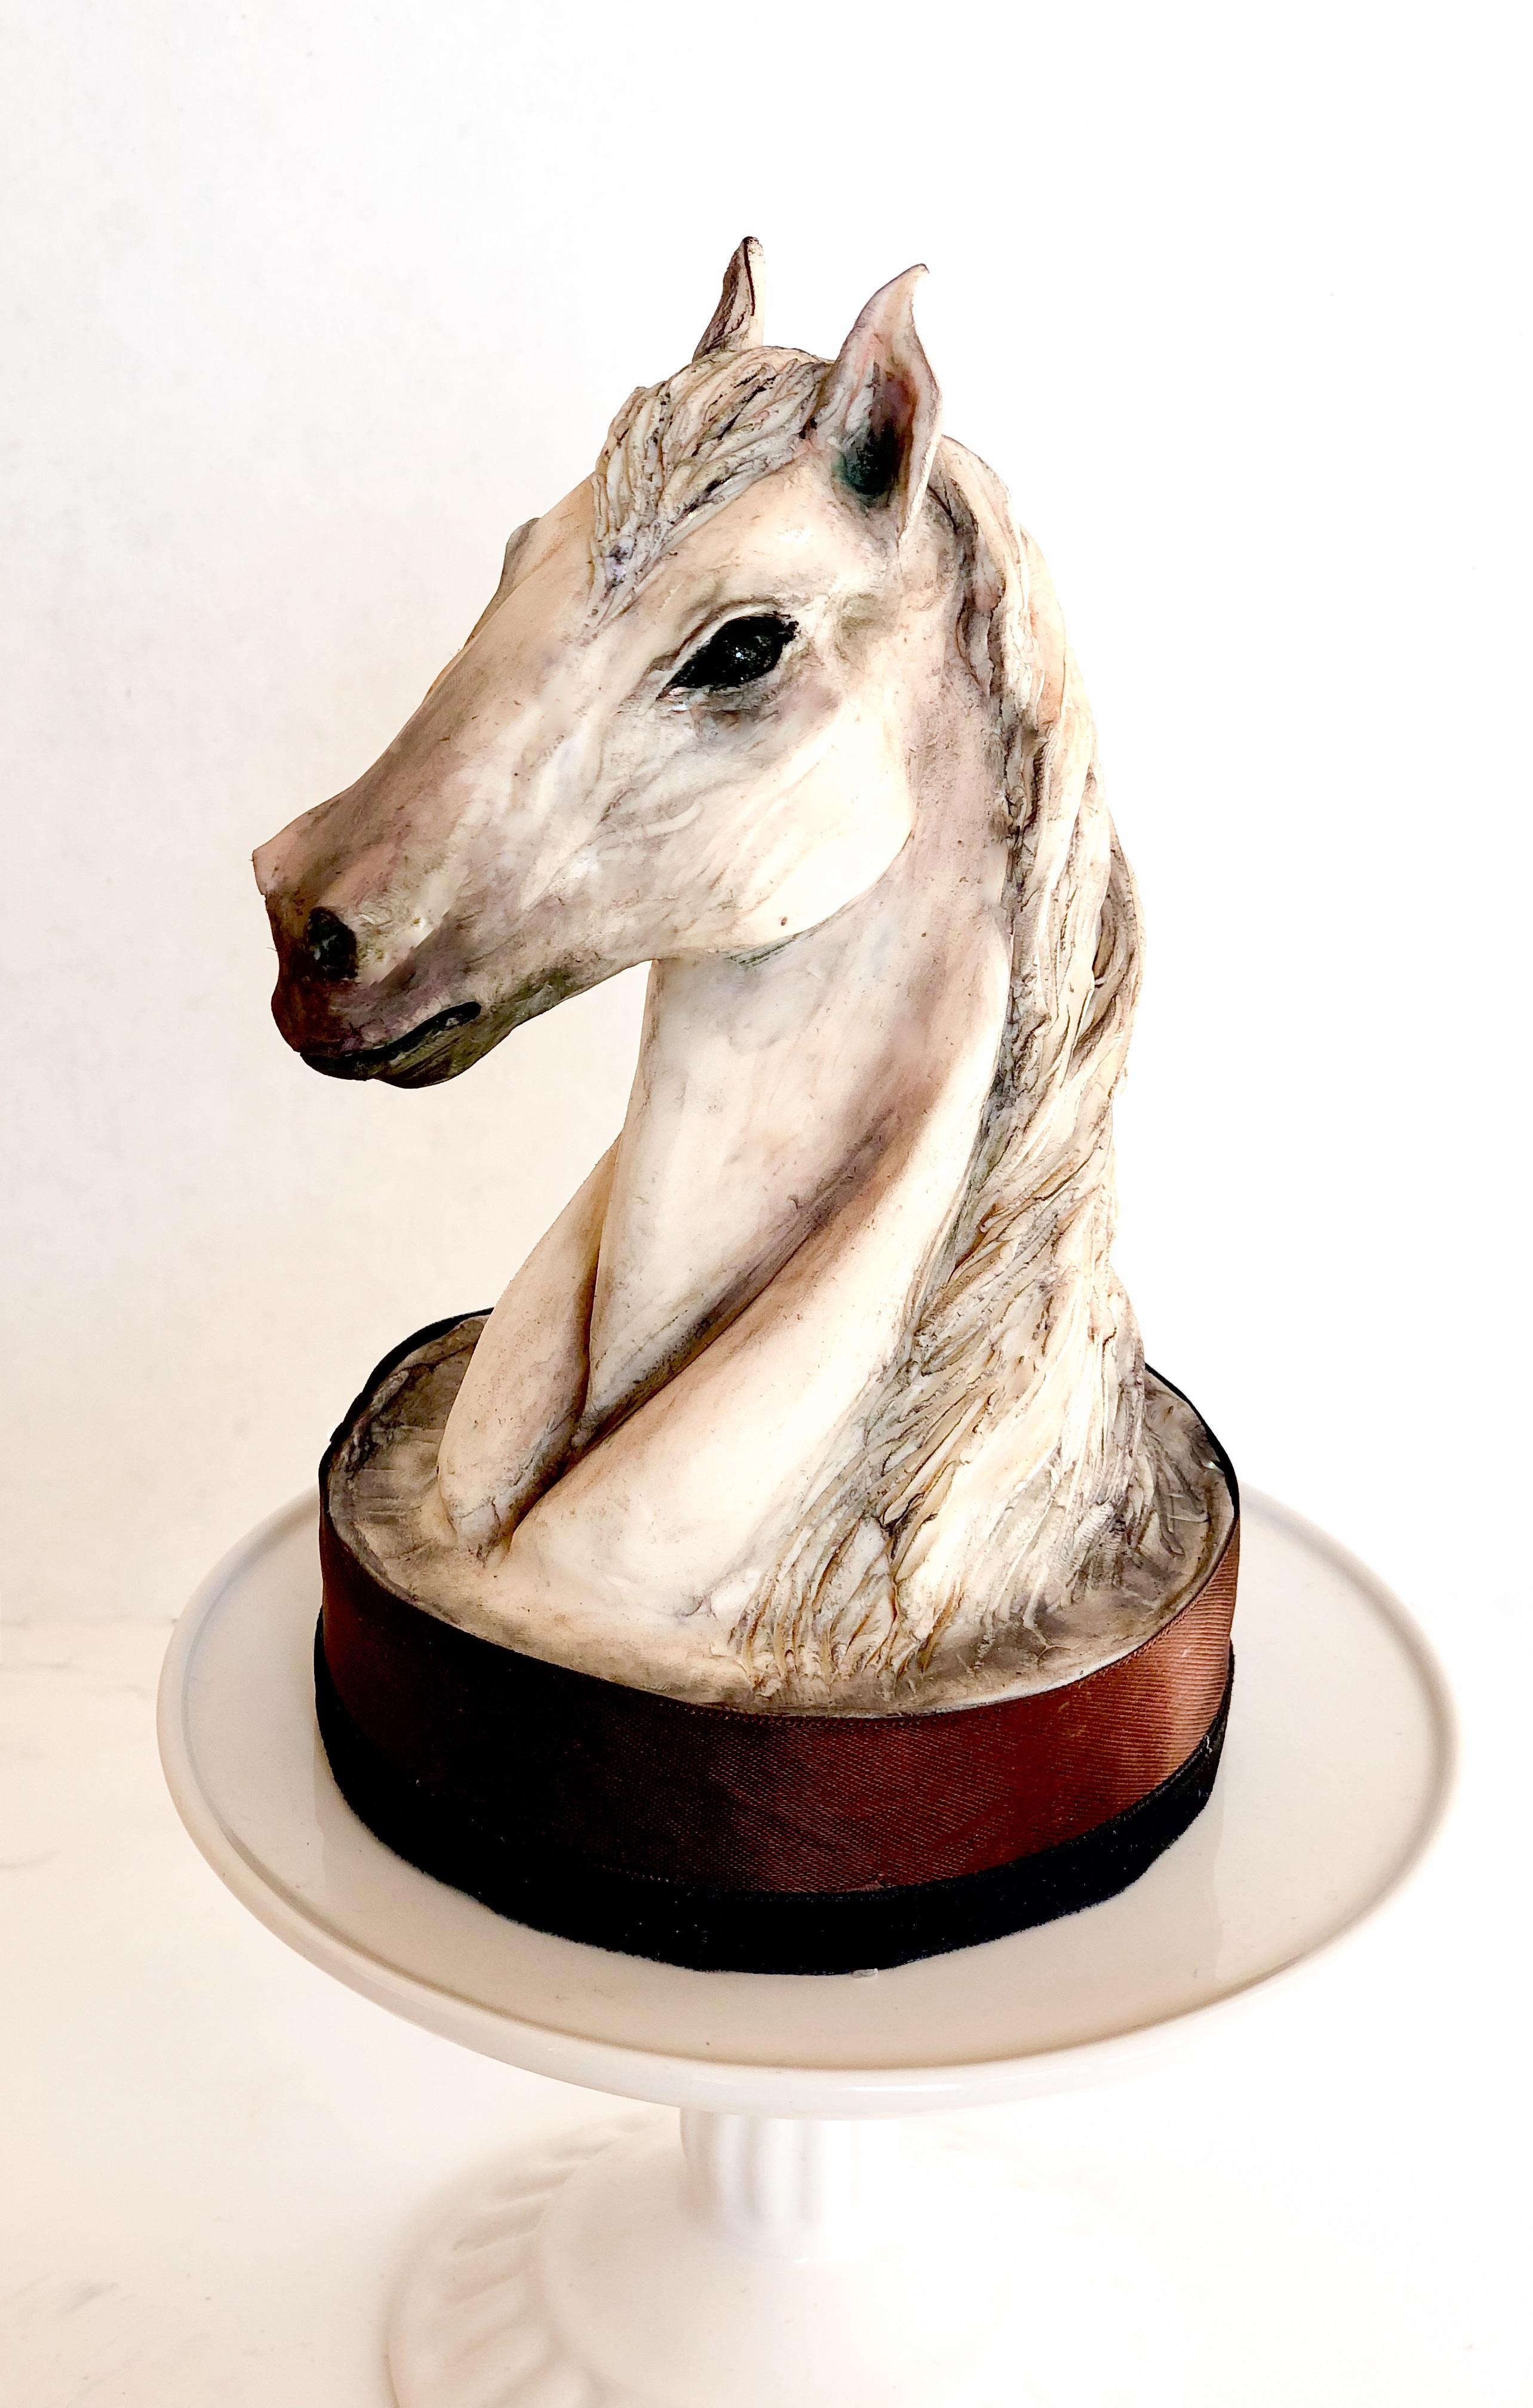 White Horse Bust Cake